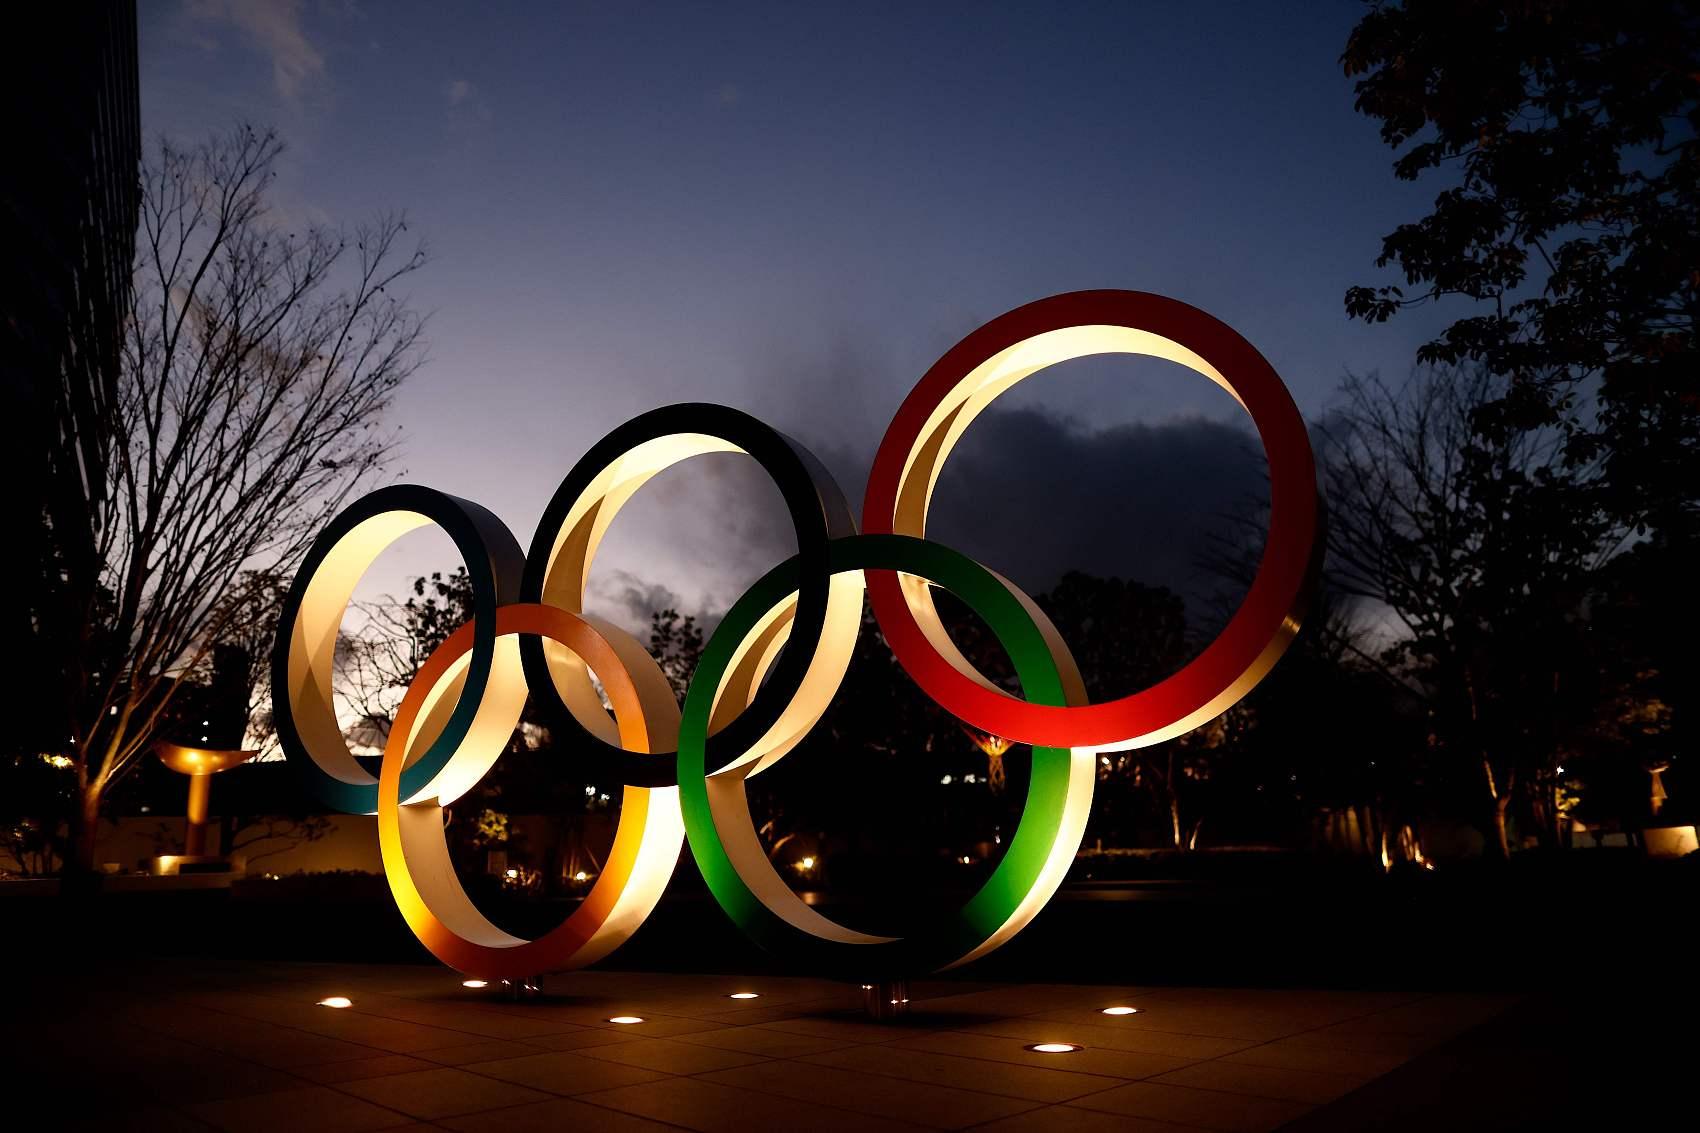 Vast majority of Japanese want Tokyo Olympics canceled or postponed